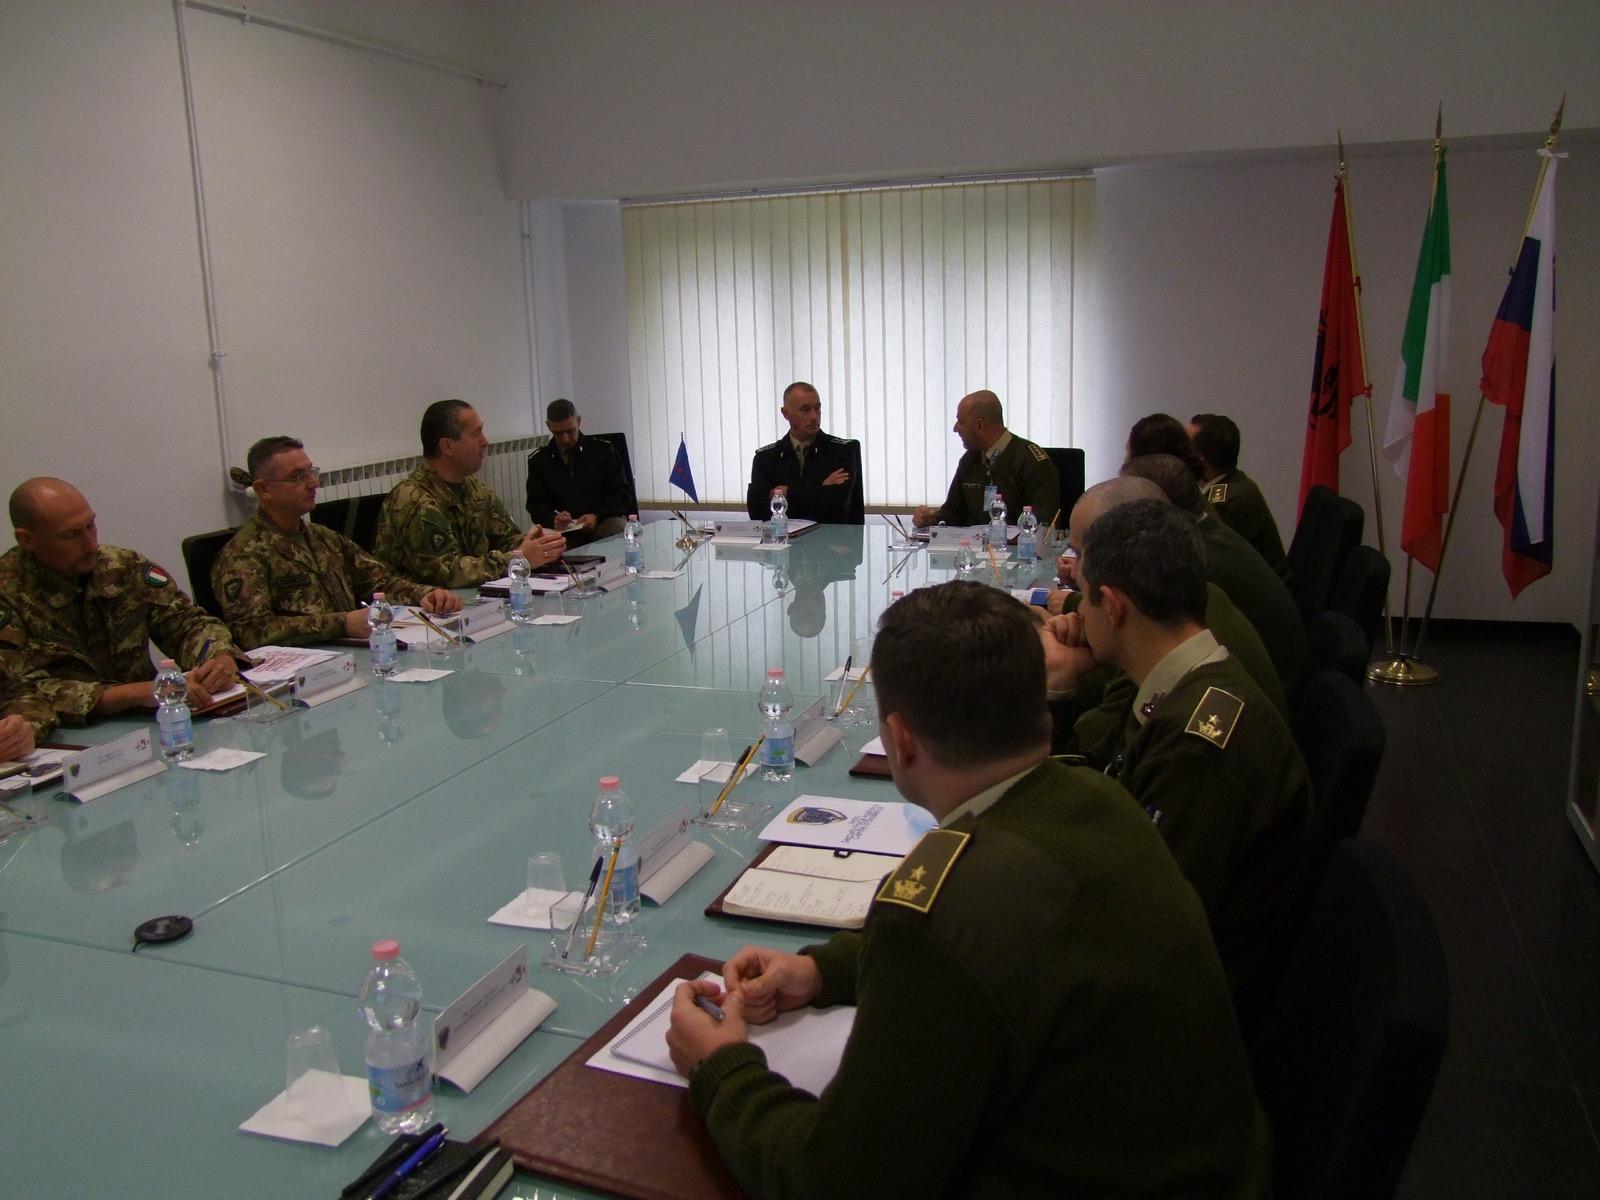 NATO SFA COE: The ITA NRDC Commander visits the Centre of Excellence